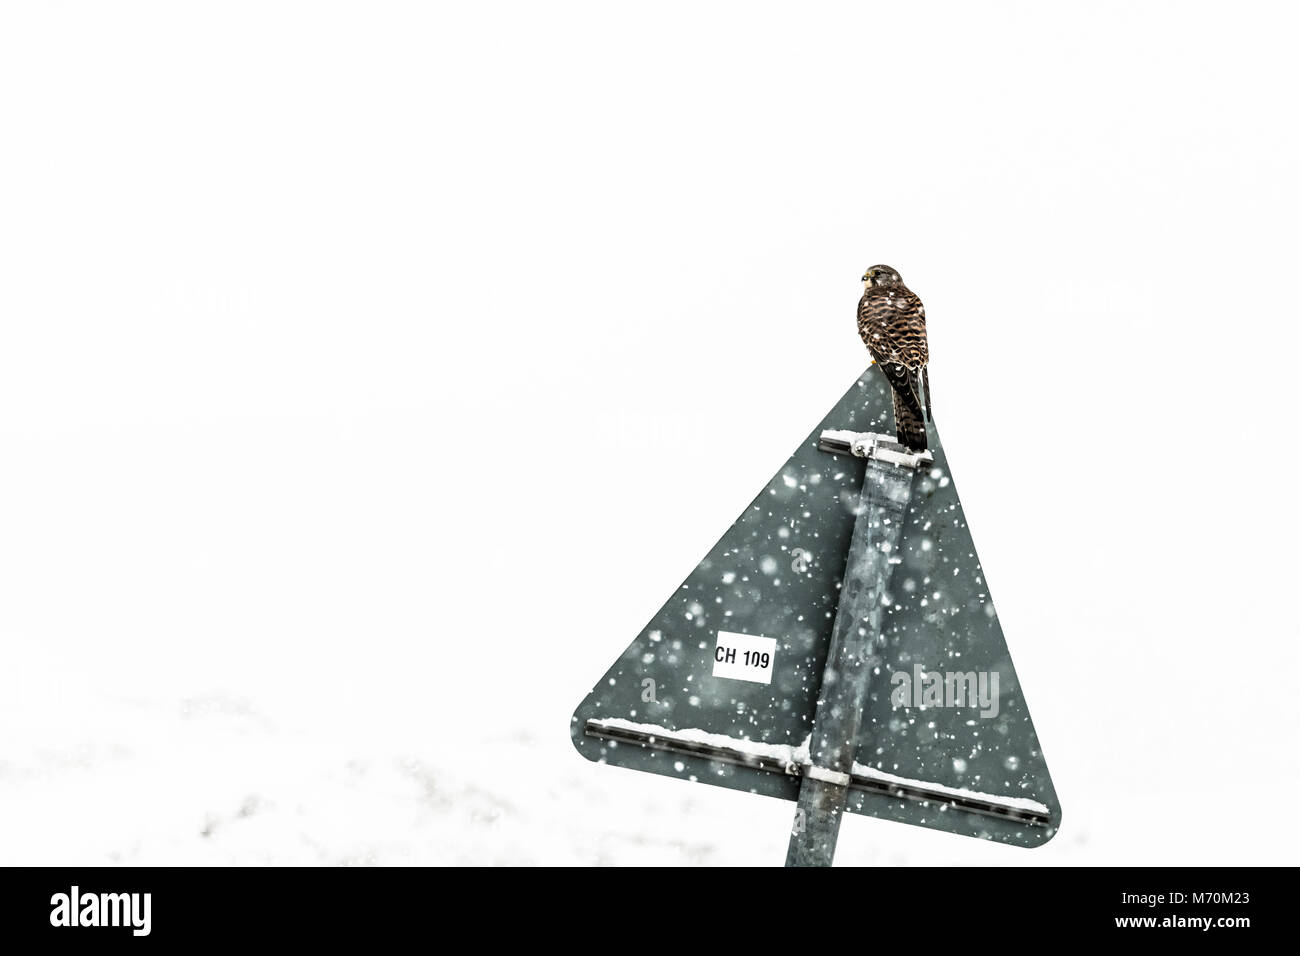 Swinside, Jedburgh, Scottish Borders, UK. 28th February 2018. A female Kestrel (Falco tinnunculus) sits on a road - Stock Image